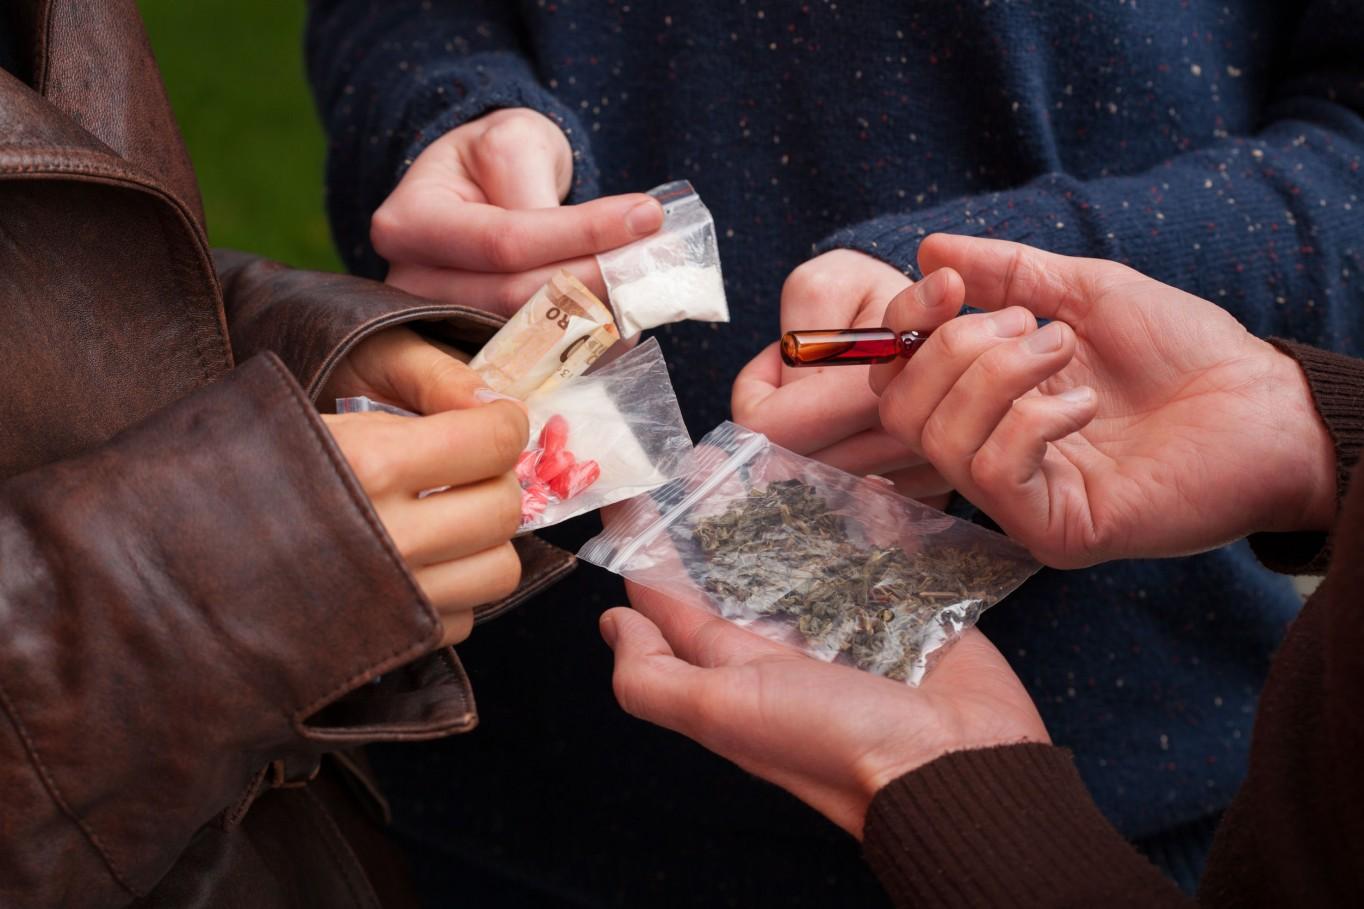 Drug dealer selling pills,marijuana and cocaine